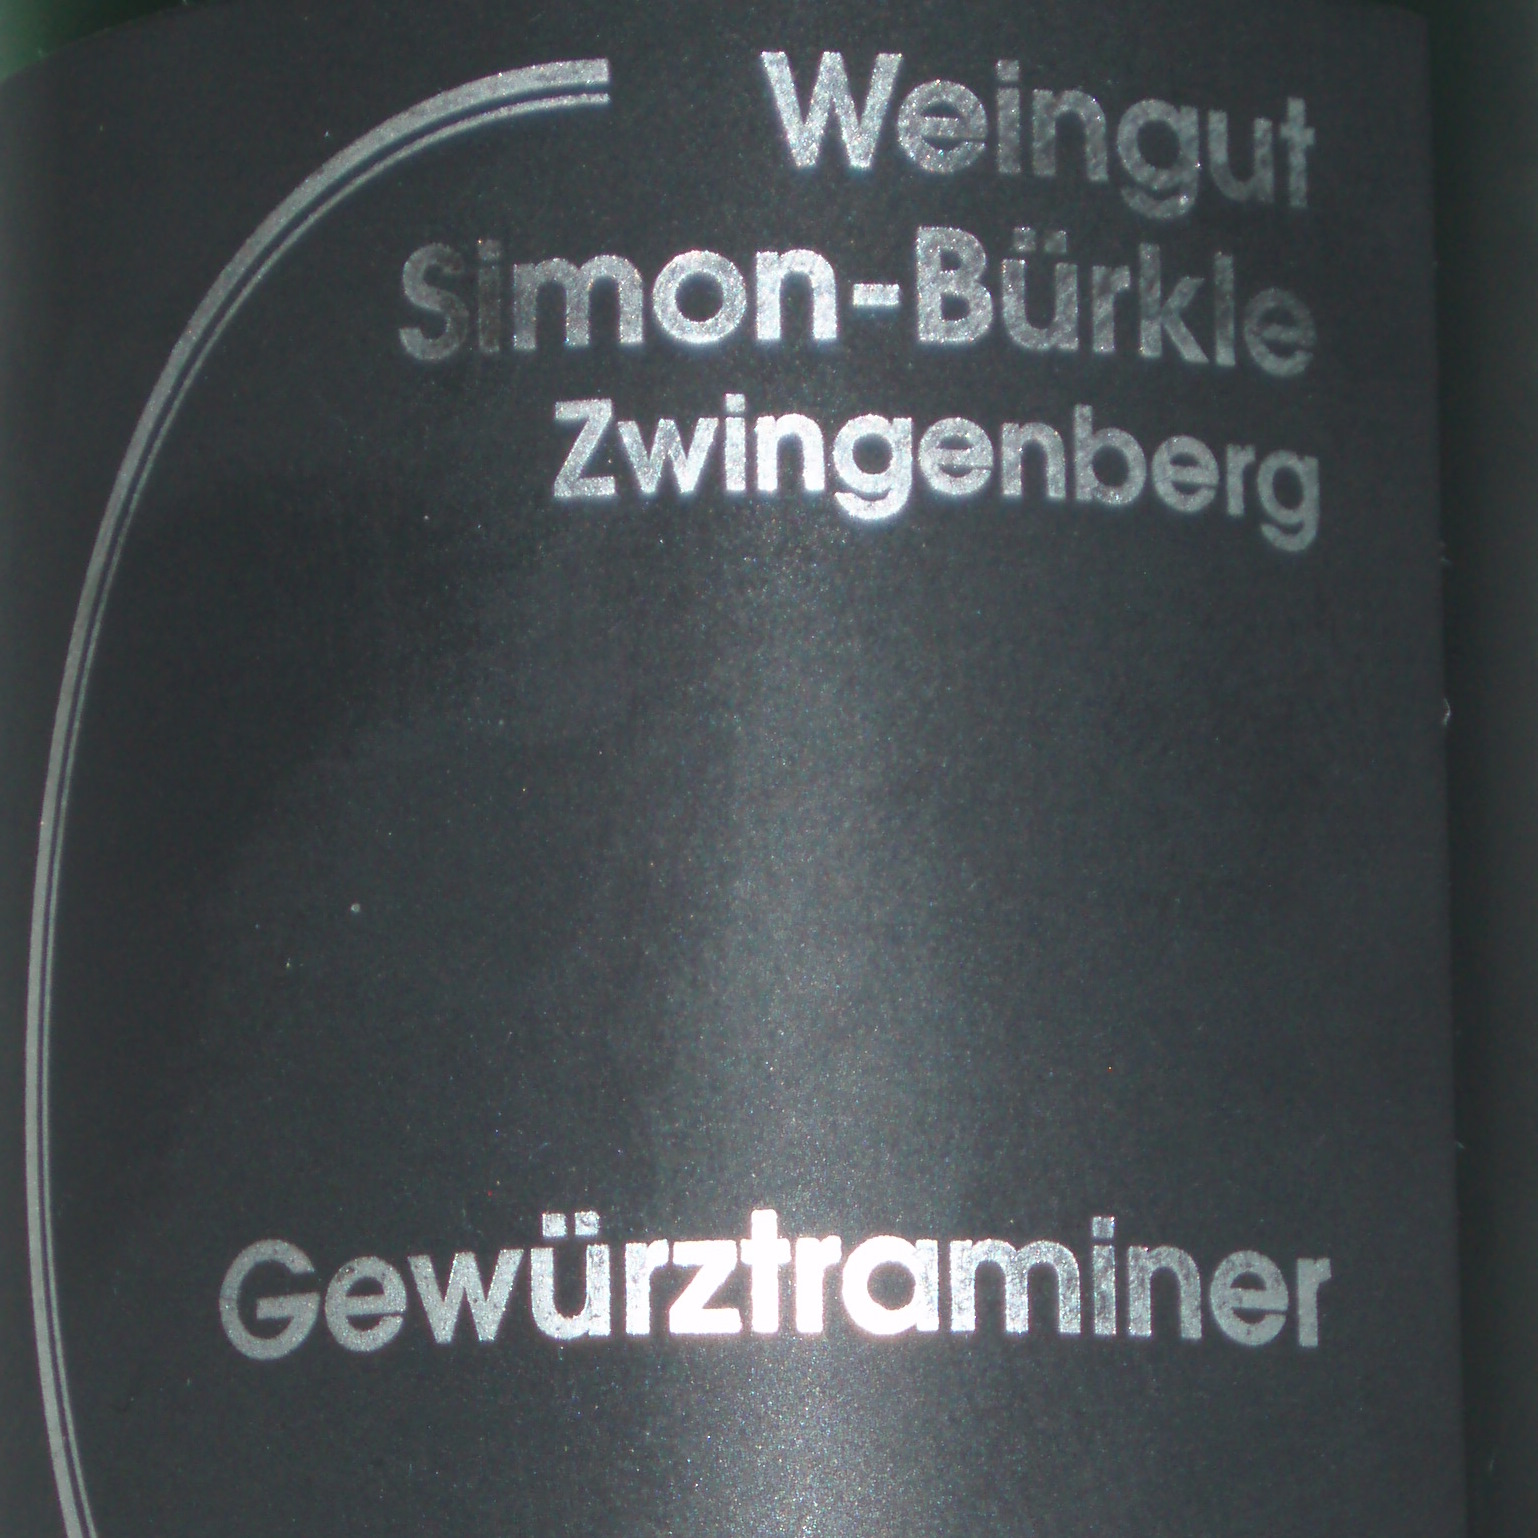 2008 Alsbacher Schöntal Gewürztraminer Spätlese, Weingut Simon-Bürkle Zwingenberg - thumb